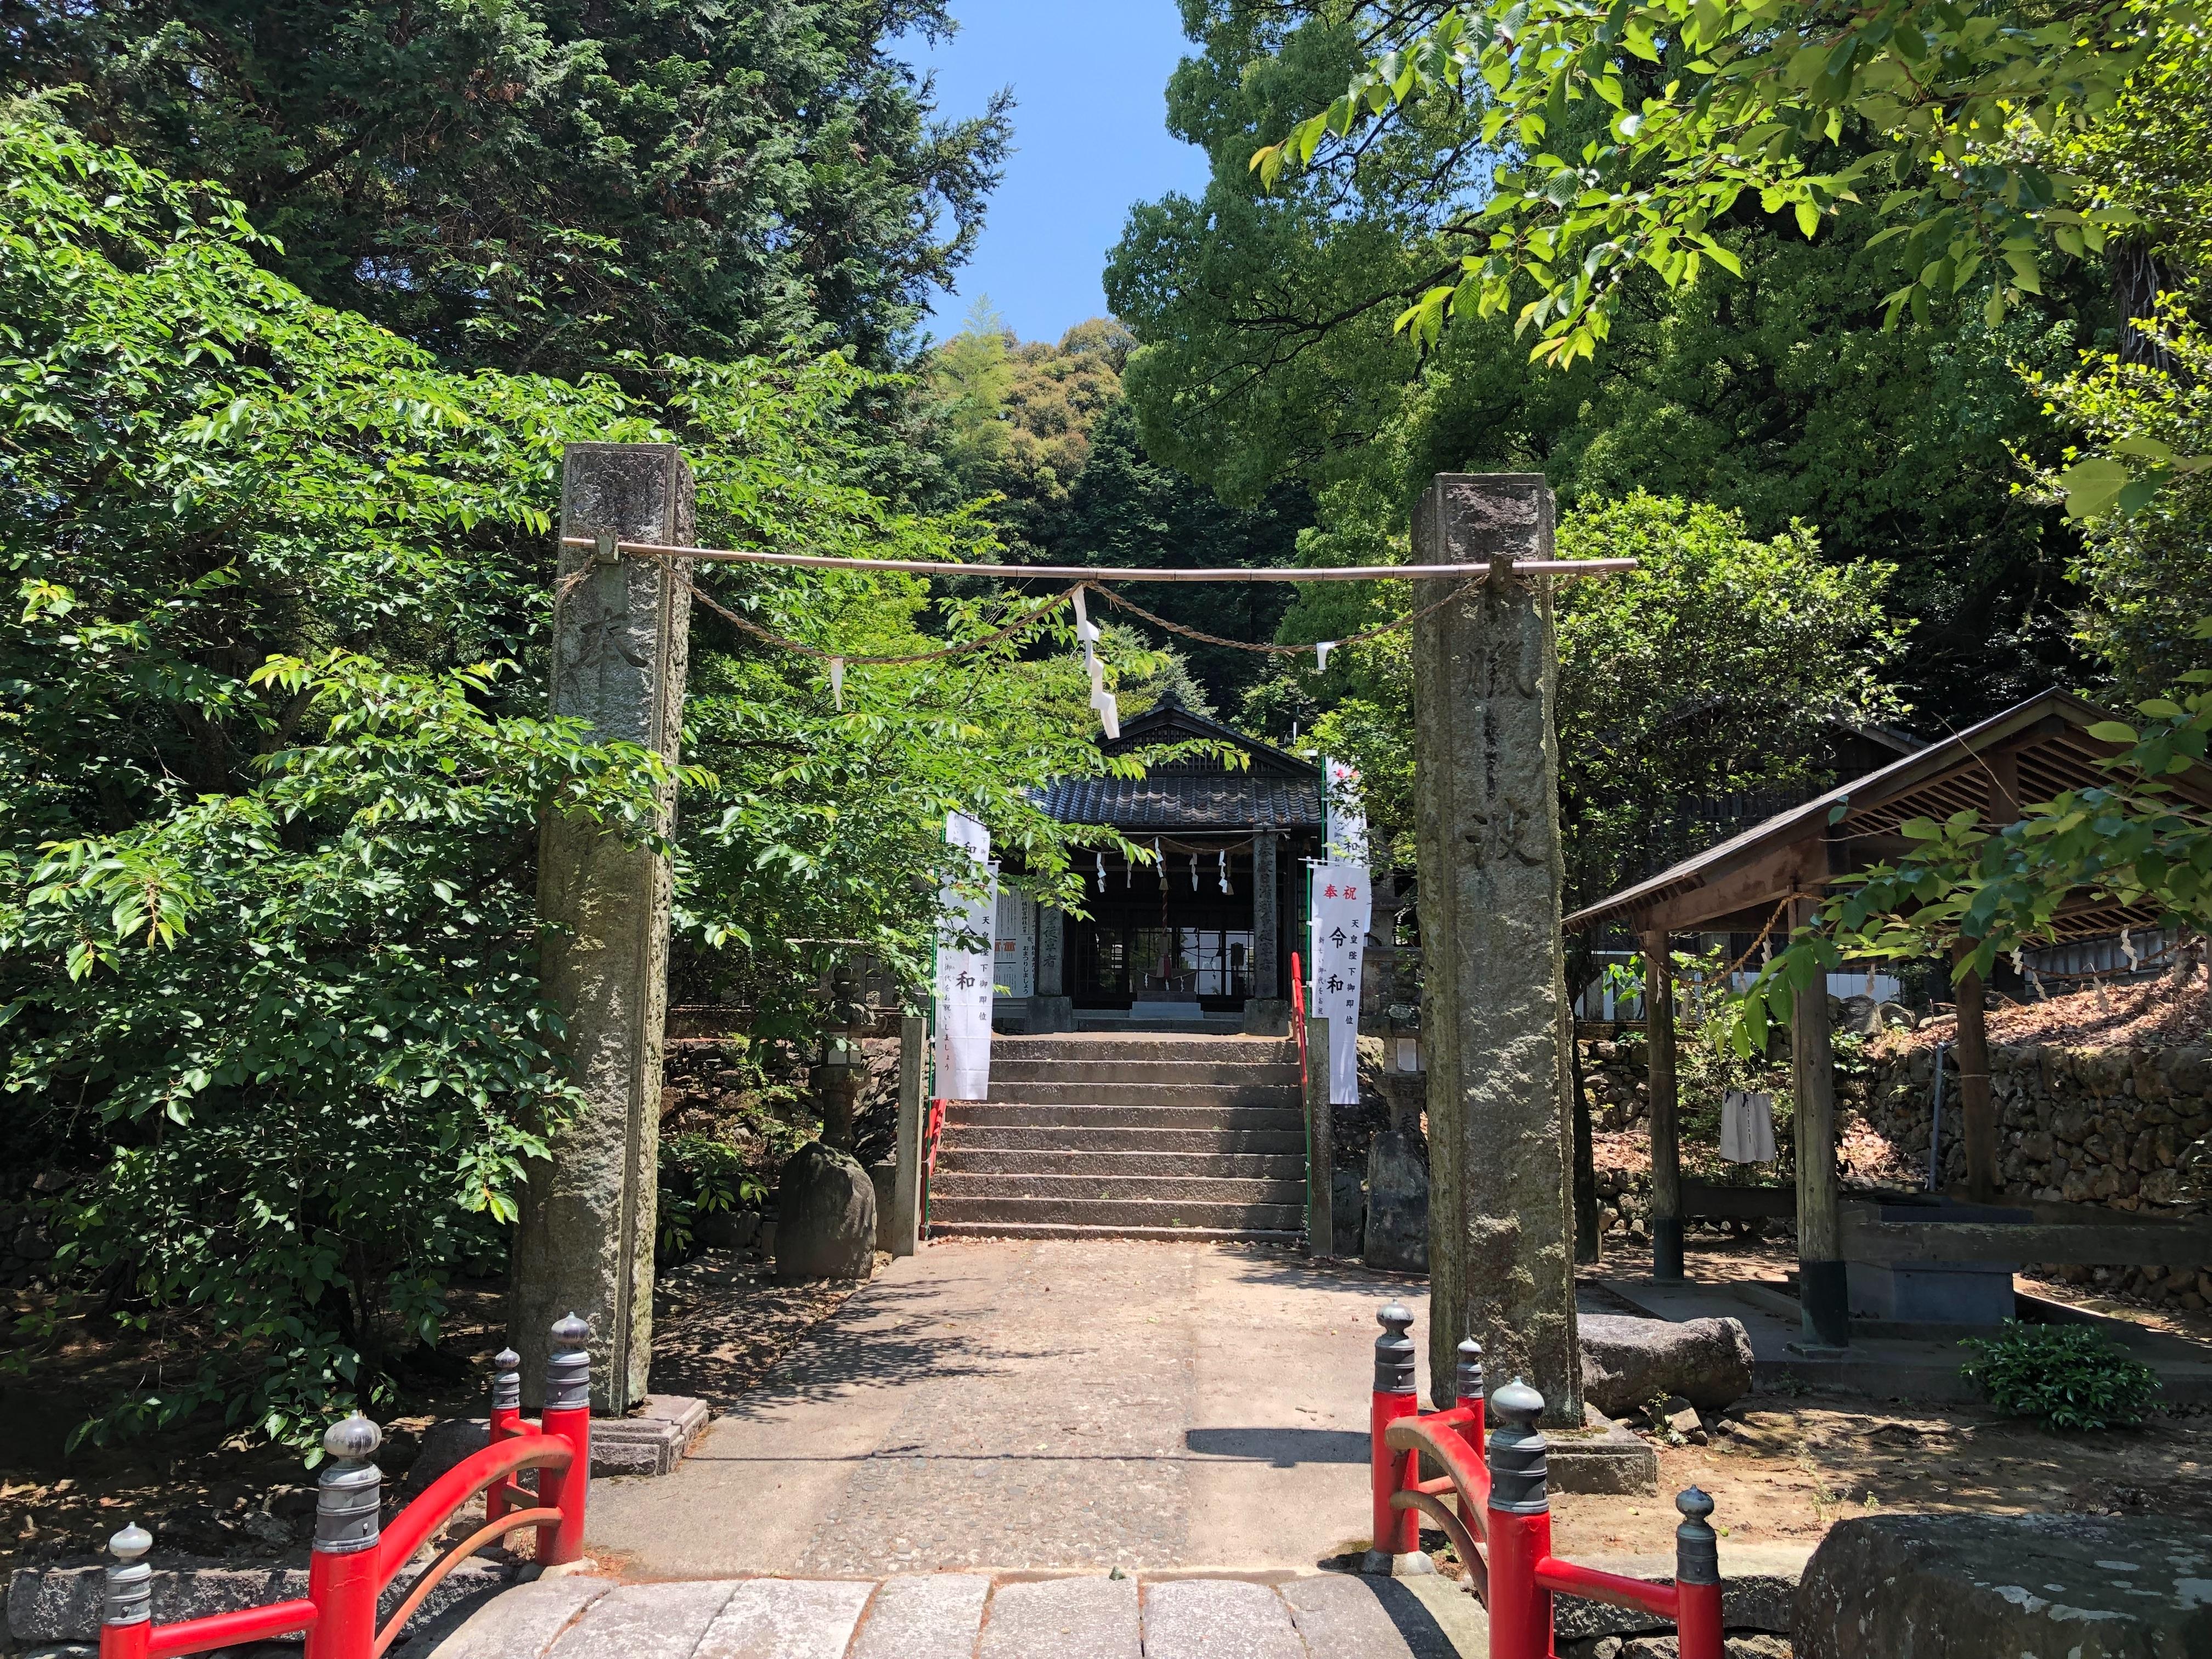 f:id:masanori-kato1972:20190523192040j:image